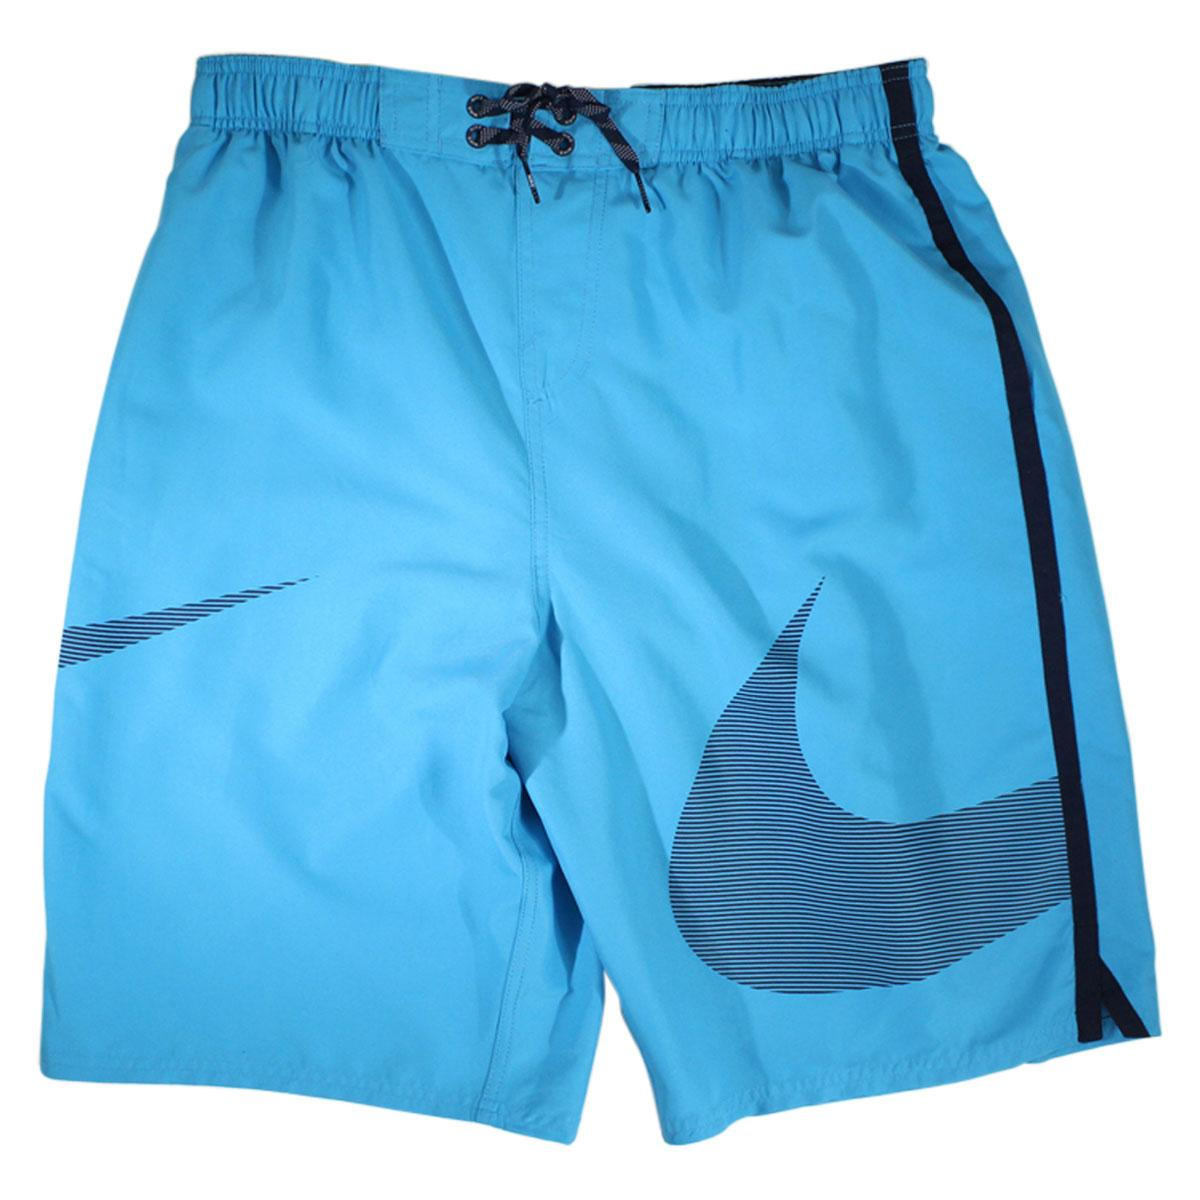 Nike Men's Macro Swoosh Diverge 11-Inch Trunks Swimwear